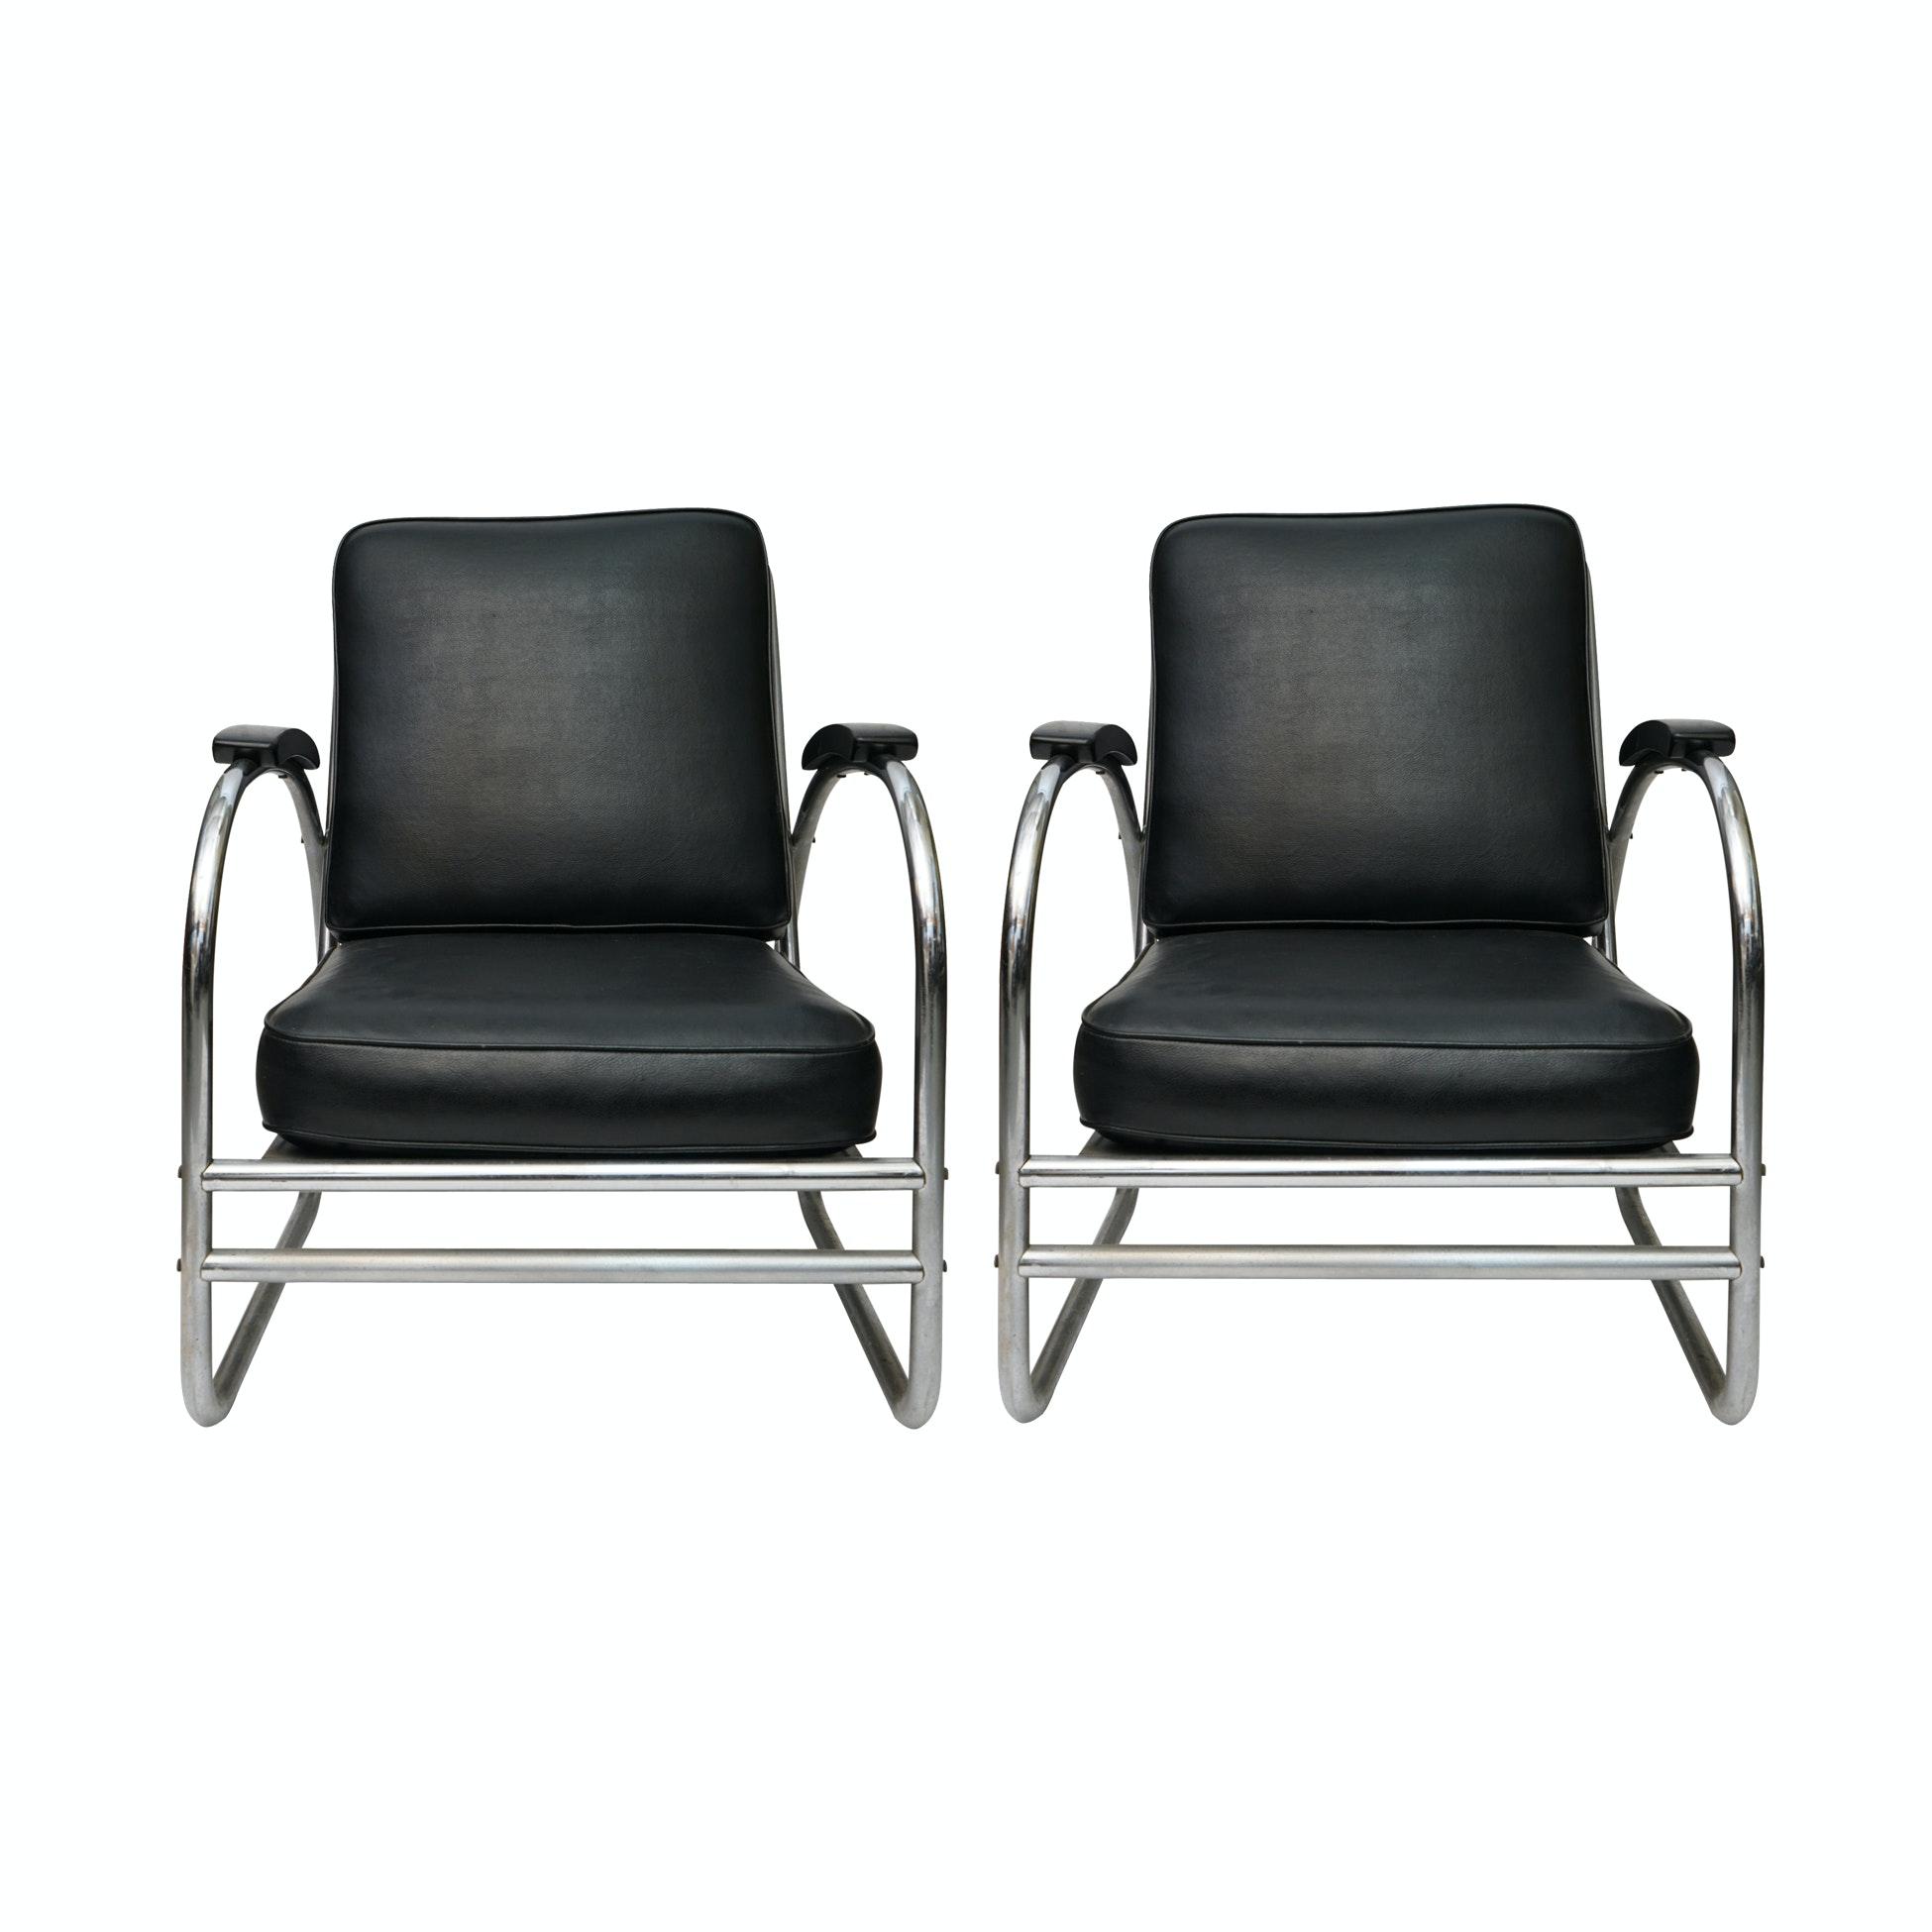 Pair of Wolfgang Hoffman Chromed Metal Lounge Chairs